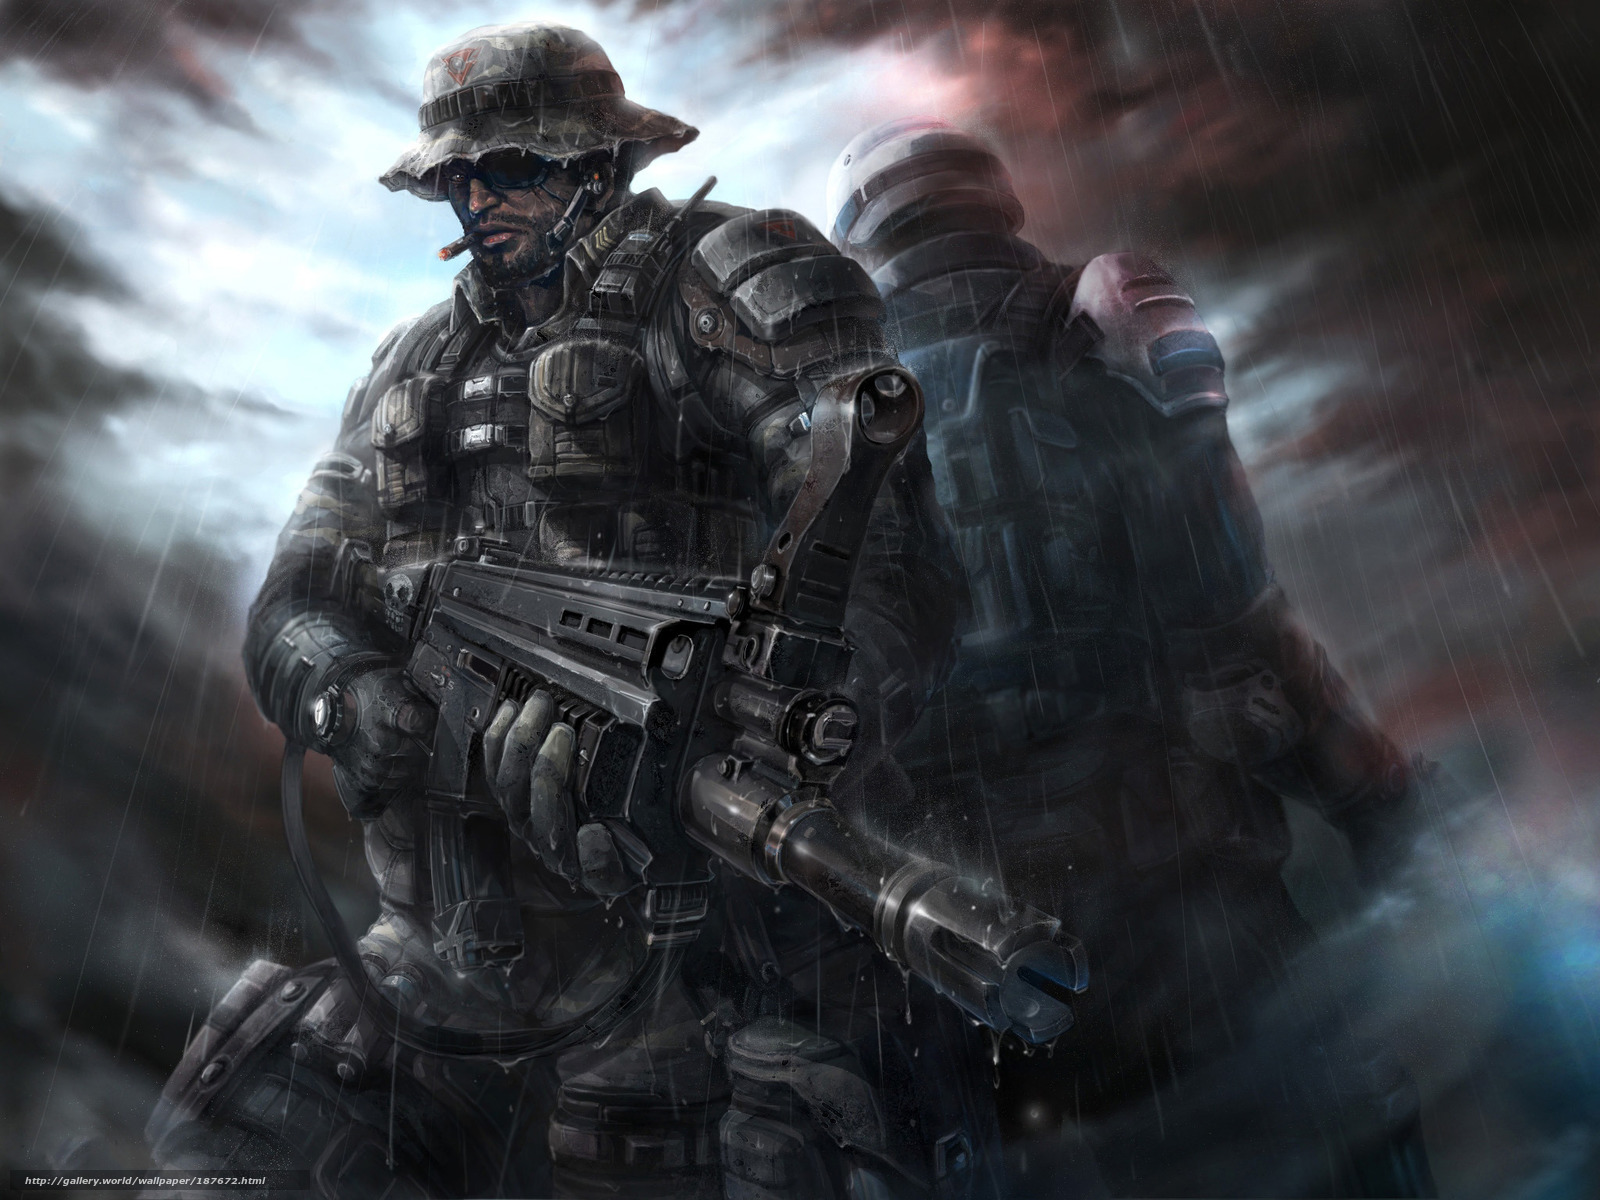 wallpaper Soldiers Special Forces machine back desktop 1600x1200